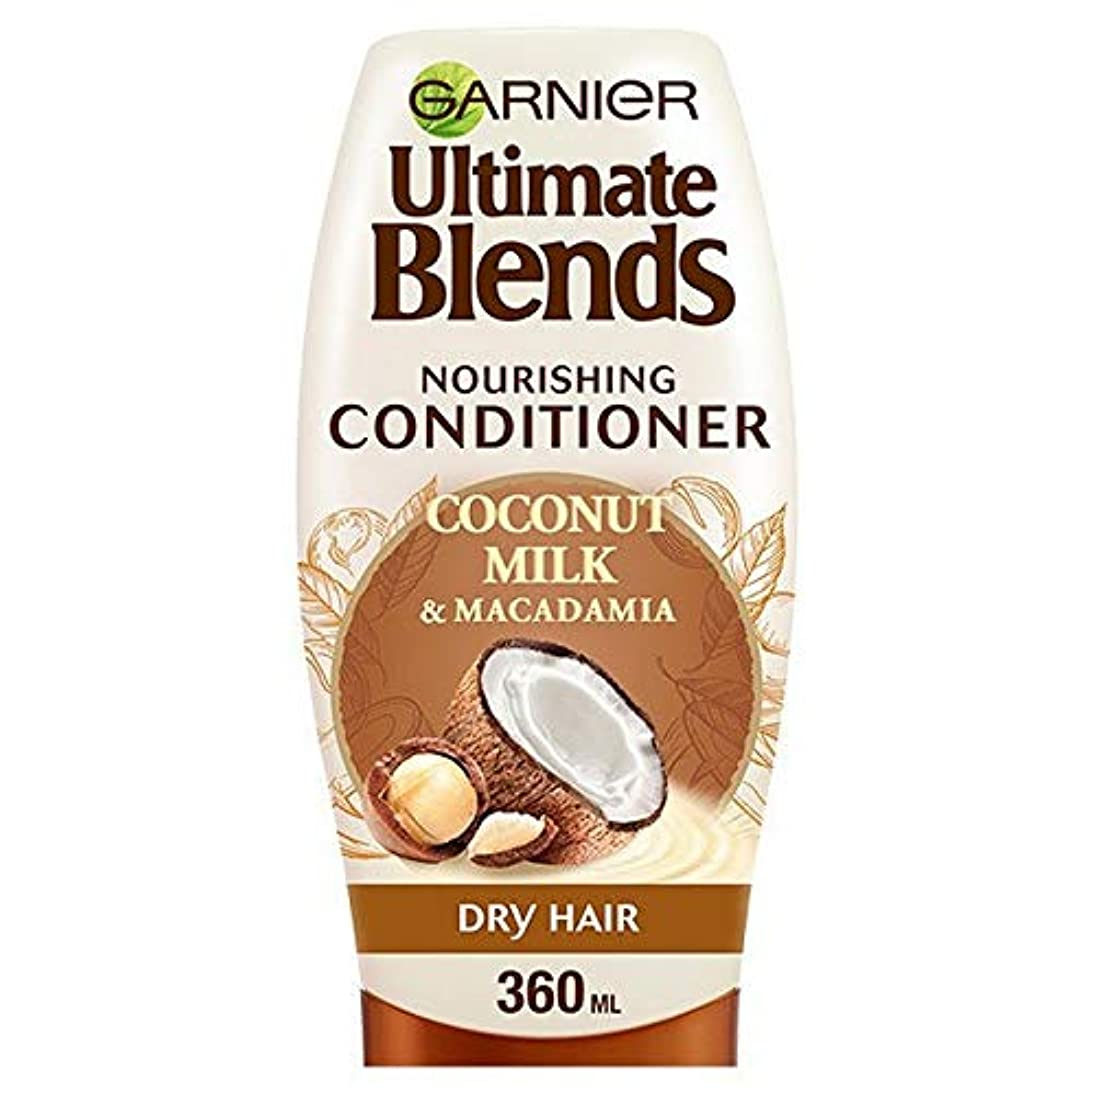 [Garnier ] 究極のブレンドココナッツミルクドライヘアコンディショナー360ミリリットル - Ultimate Blends Coconut Milk Dry Hair Conditioner 360ml [並行輸入品]